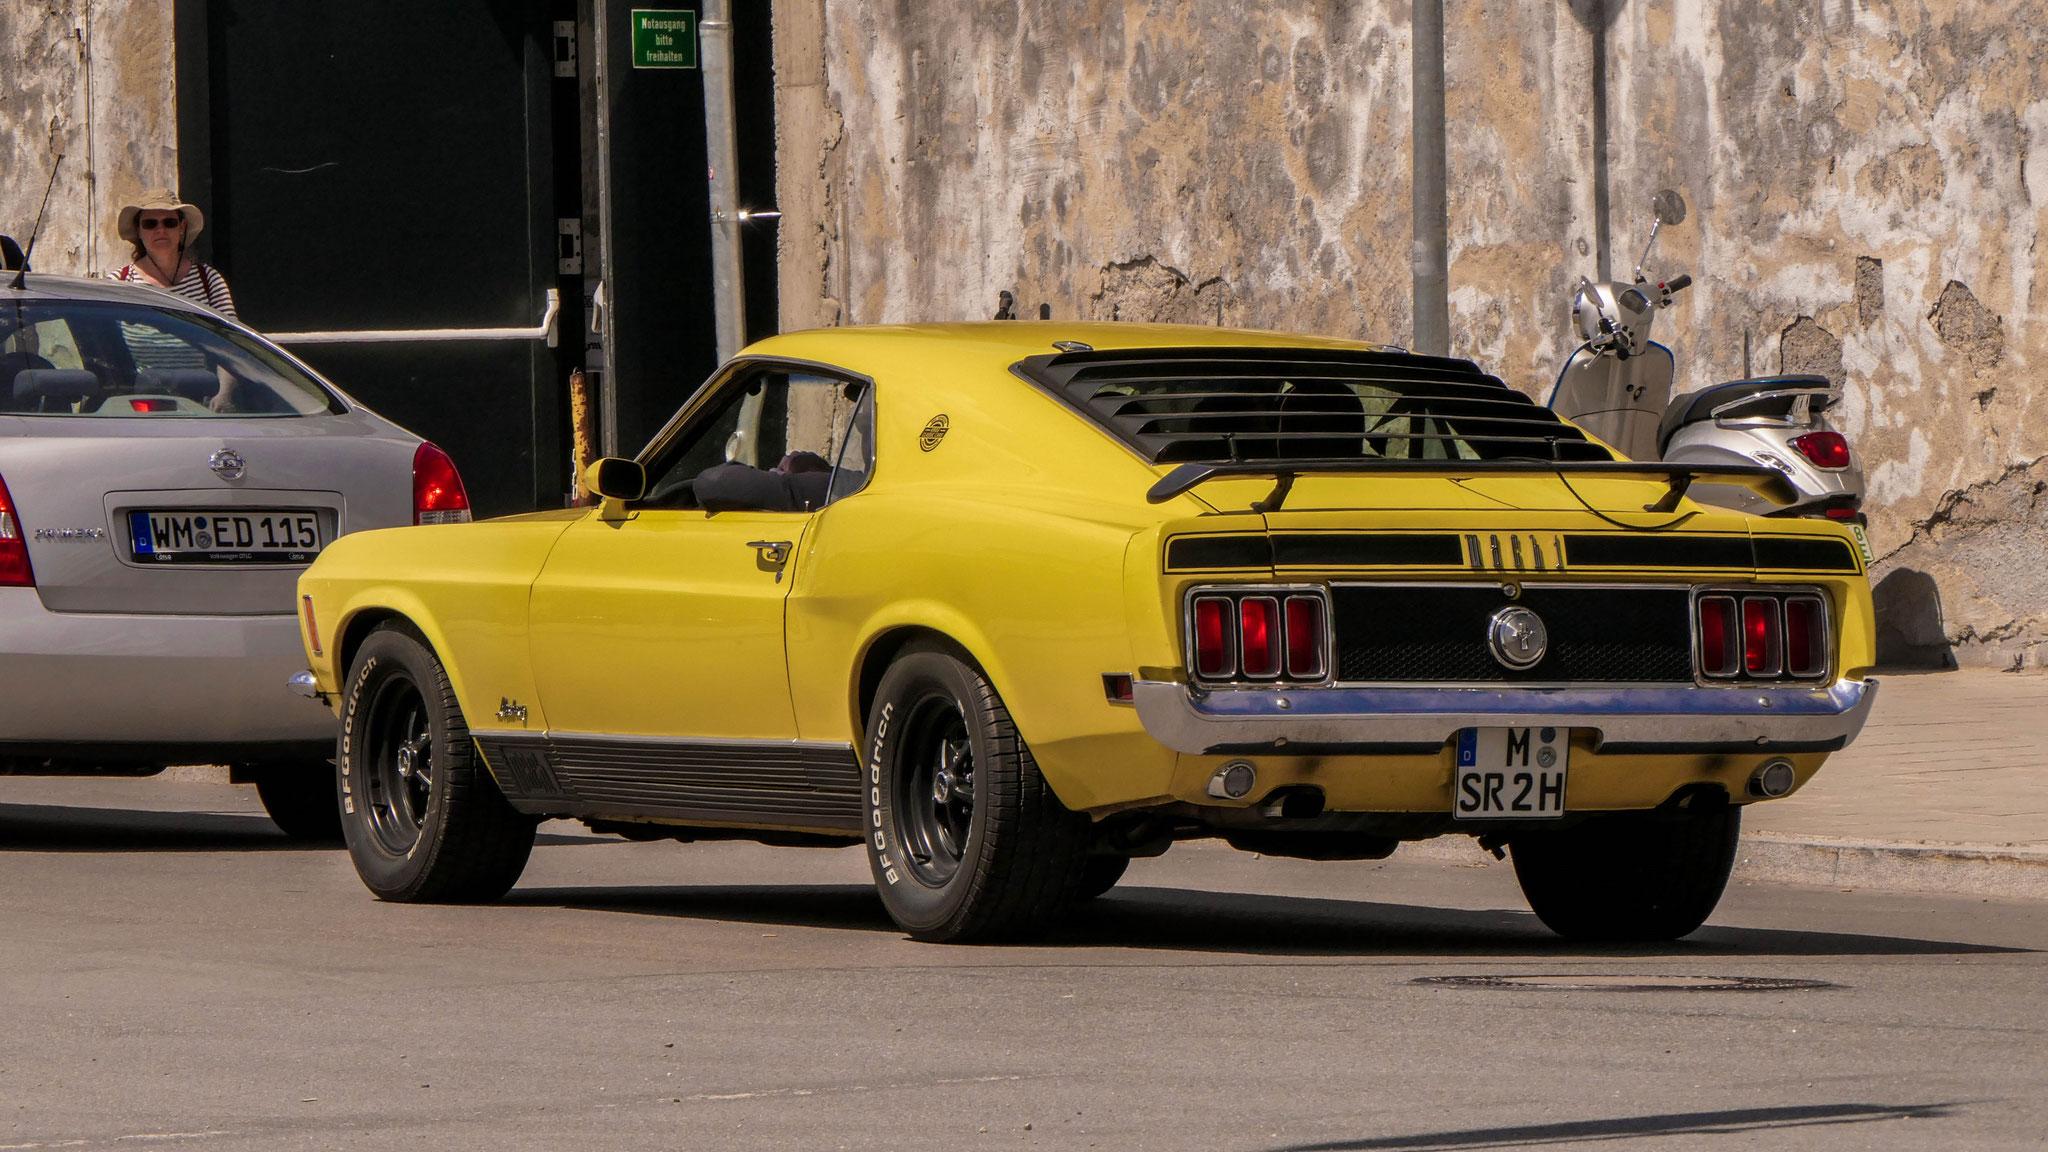 Mustang Mach 1 - M-SR-2H